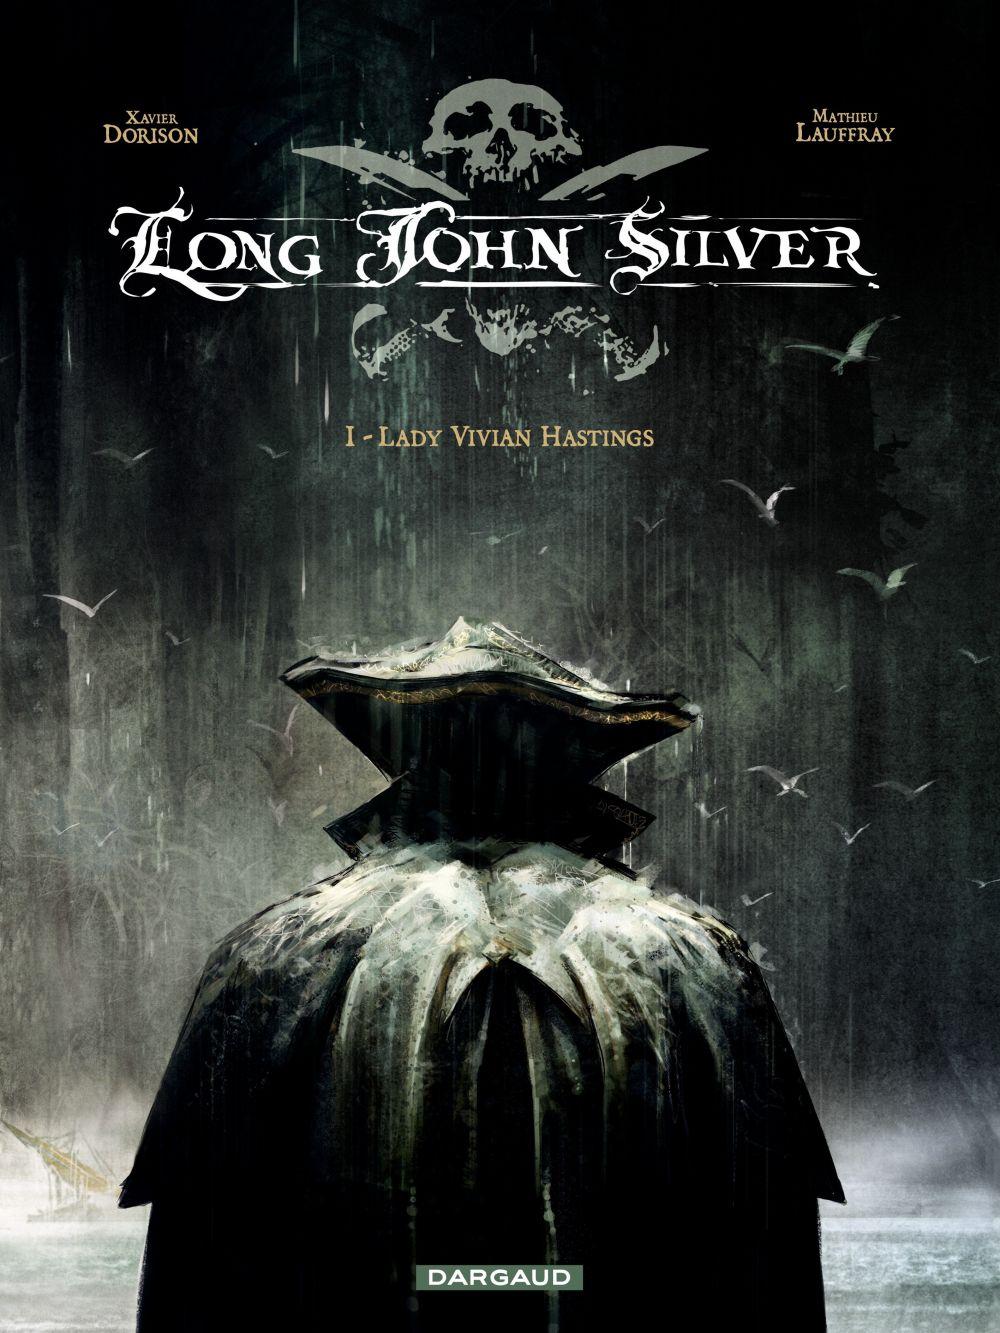 Long John Silver – tome 1 - Lady Vivian Hastings | Lauffray, Mathieu (1970-....). Auteur